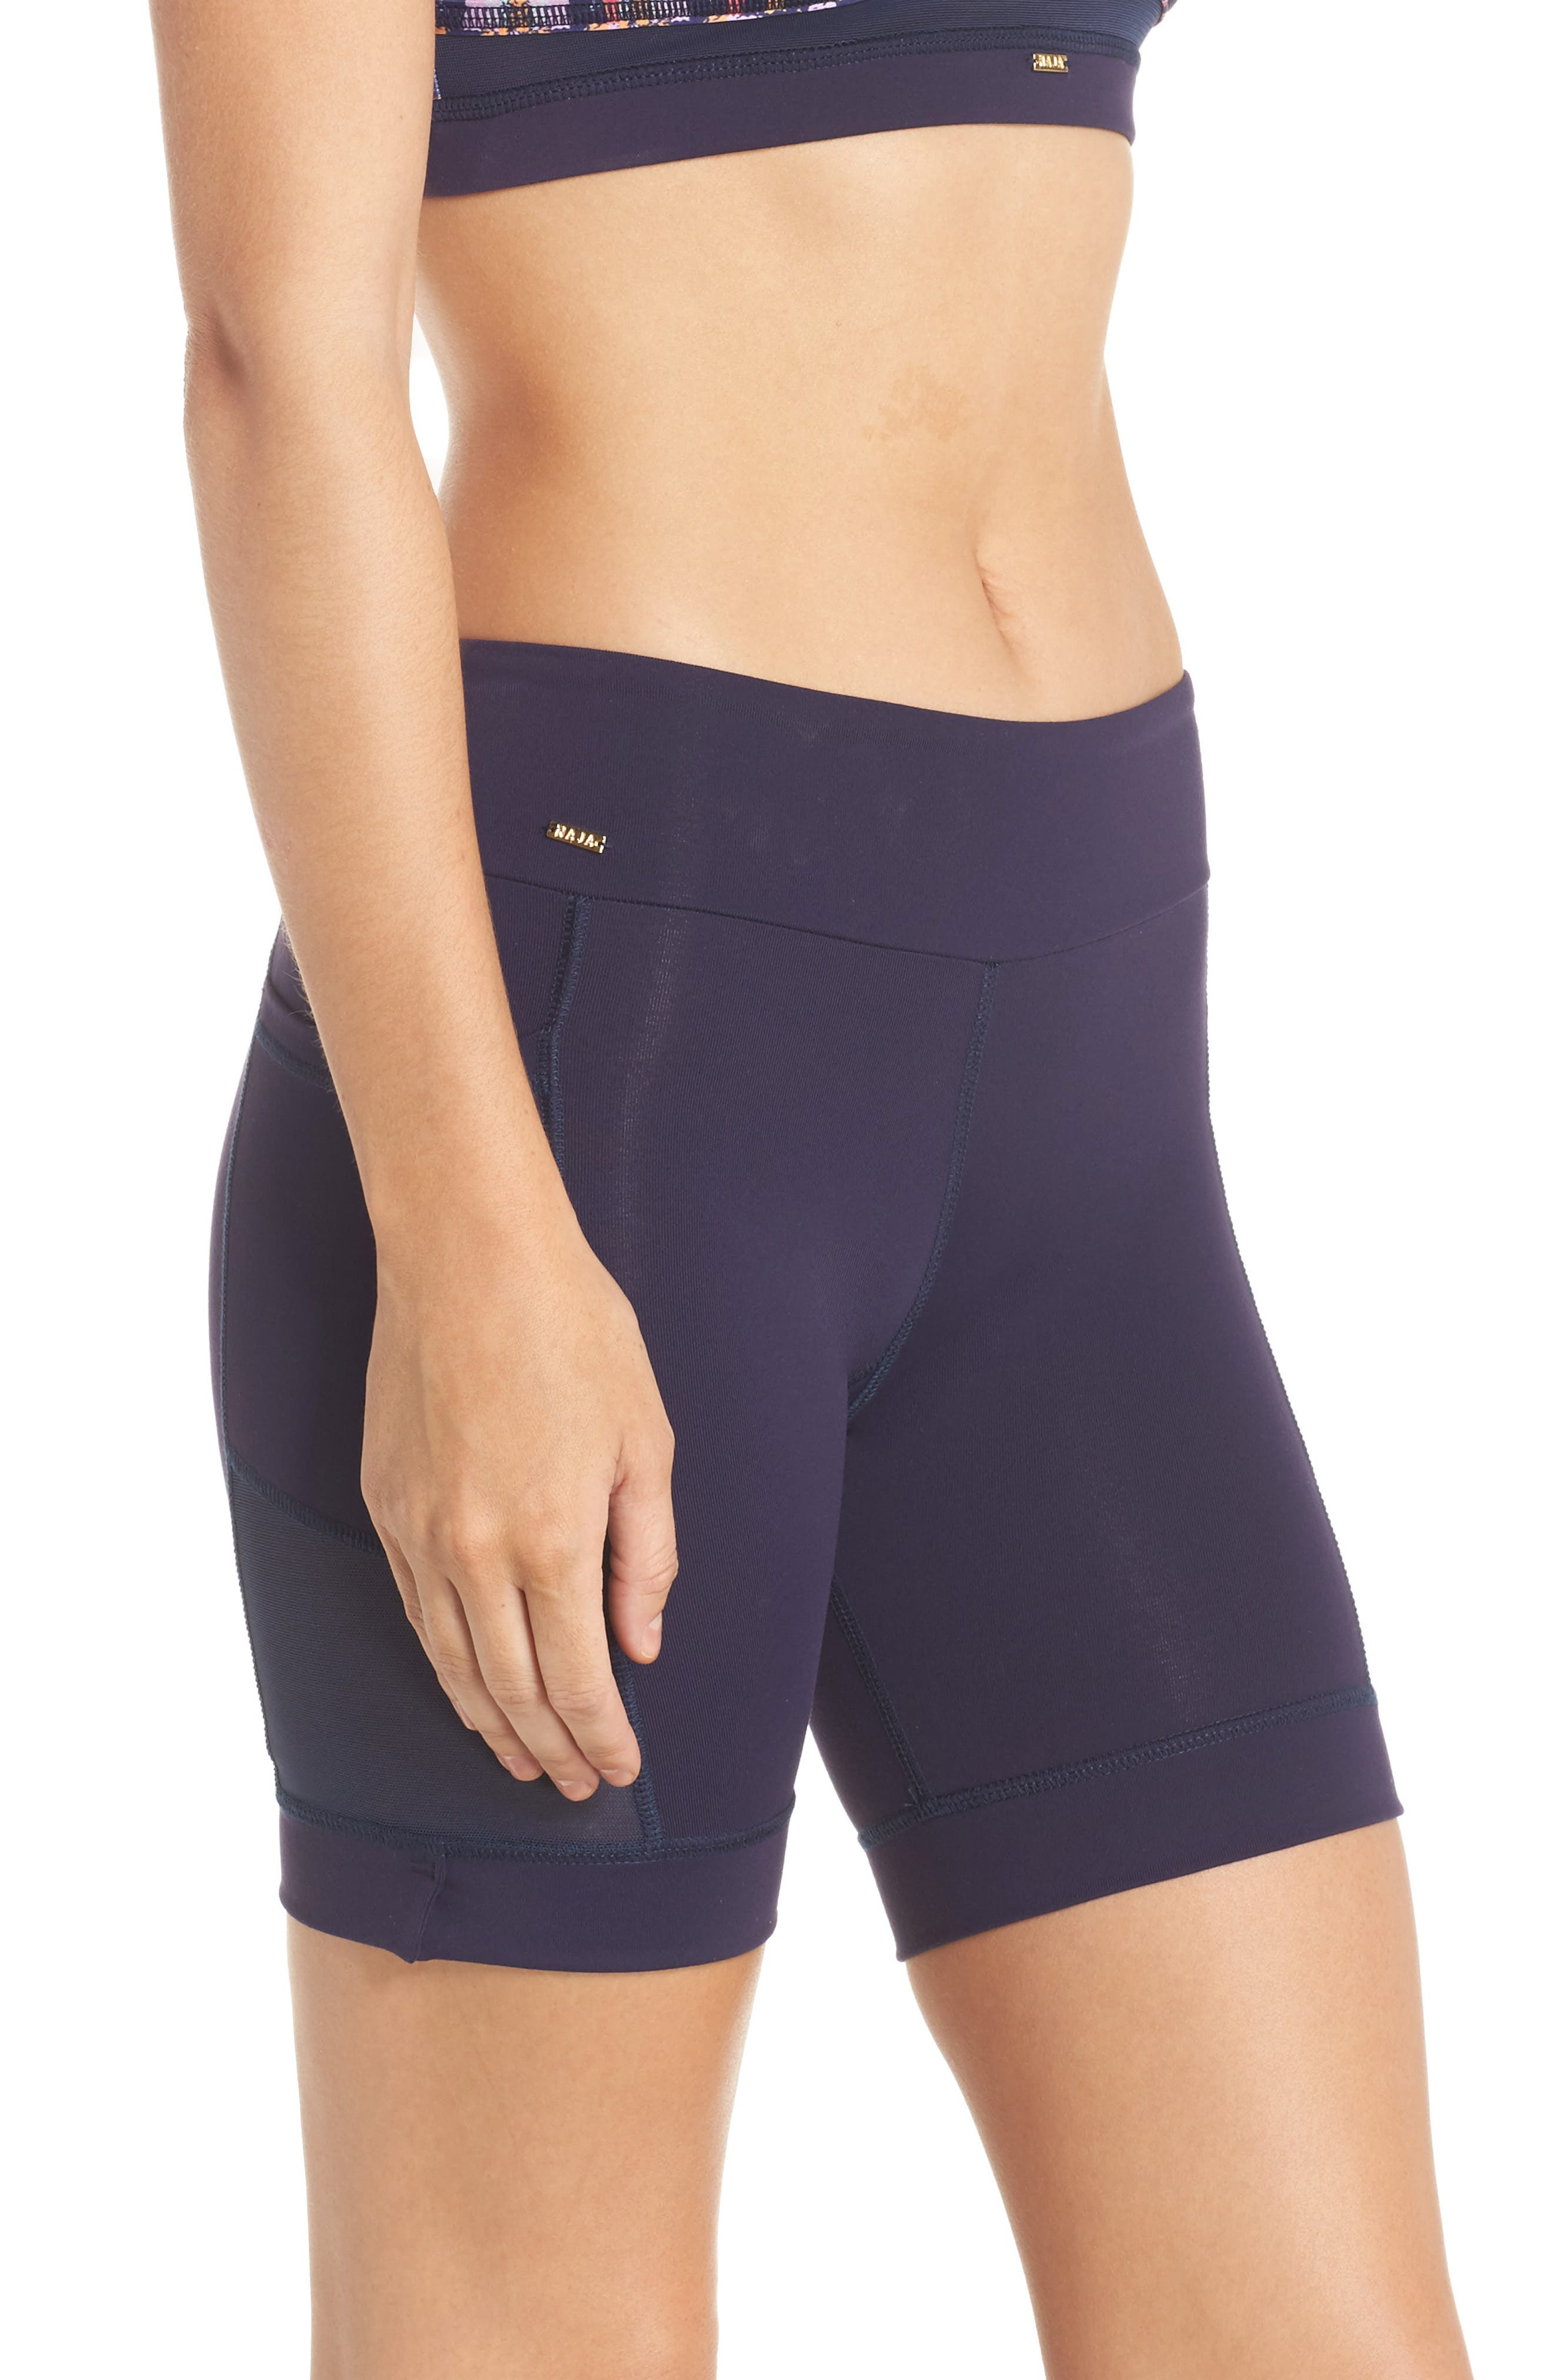 Nicole Active Shorts,                             Alternate thumbnail 3, color,                             Navy Mesh